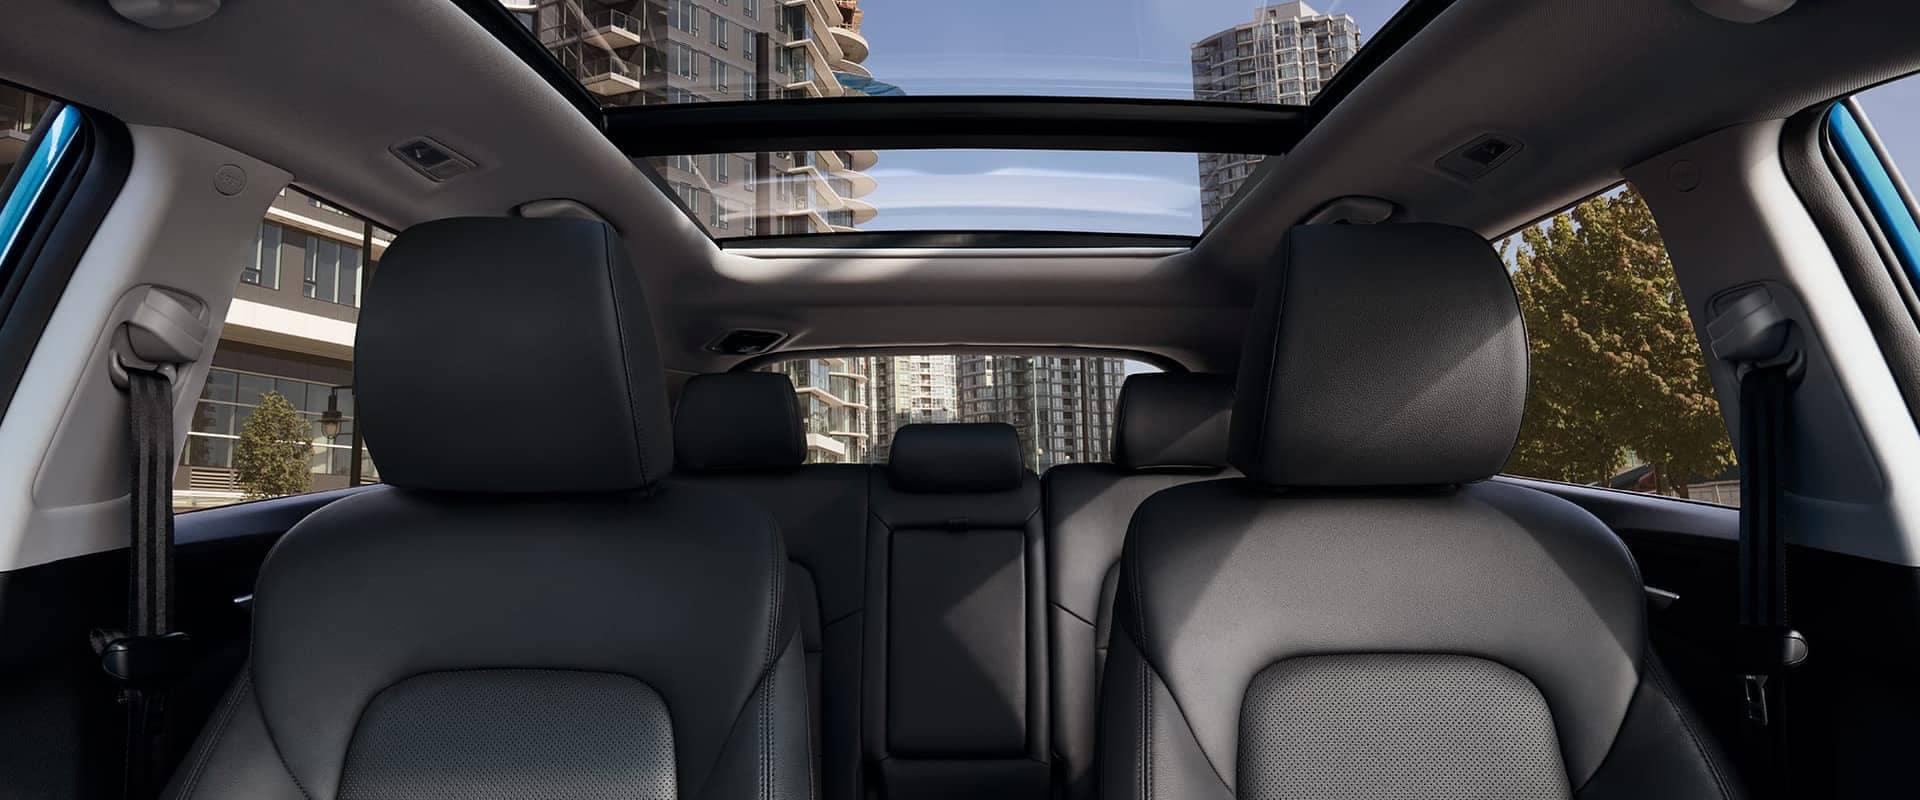 2019 Hyundai Tucson Seating